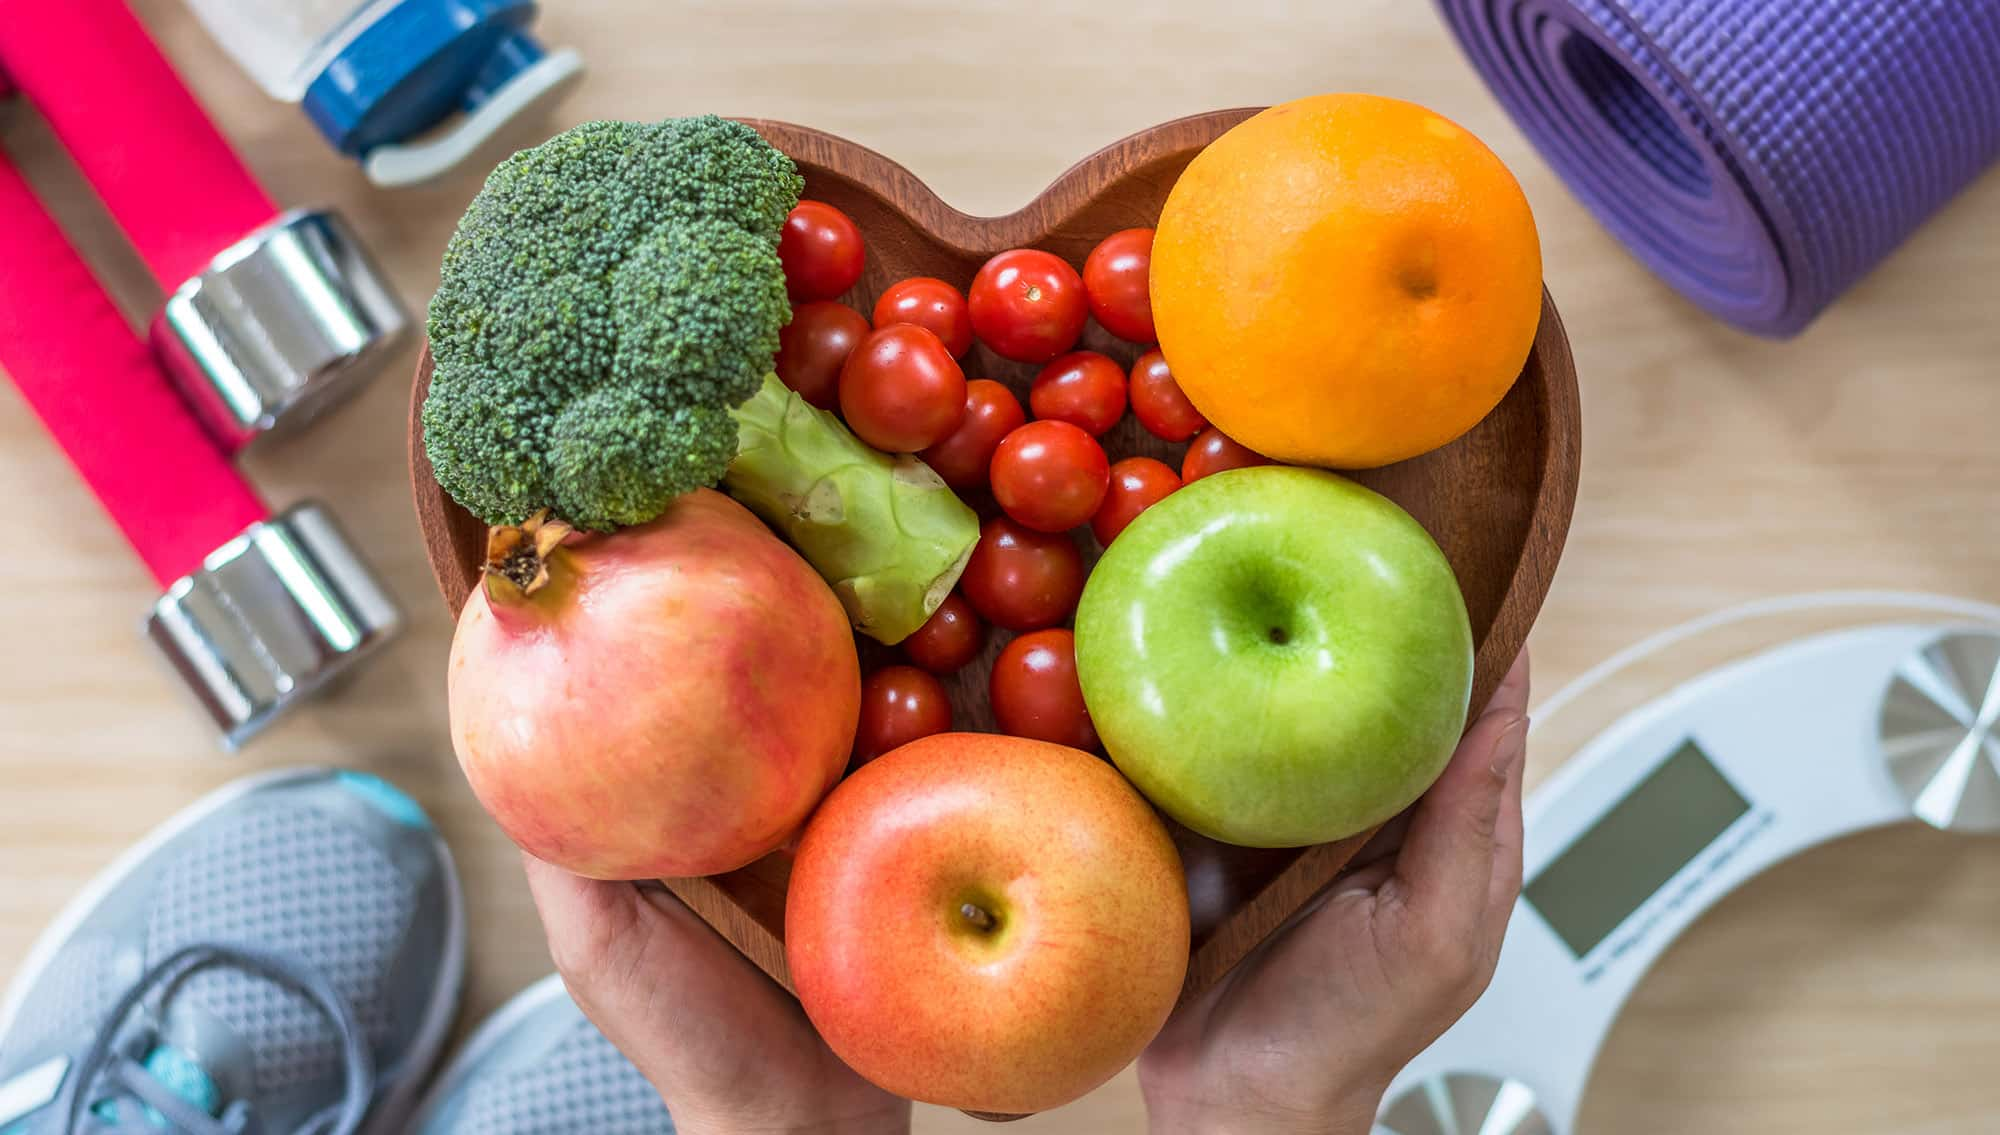 general practitioner helps keeps patients healthy